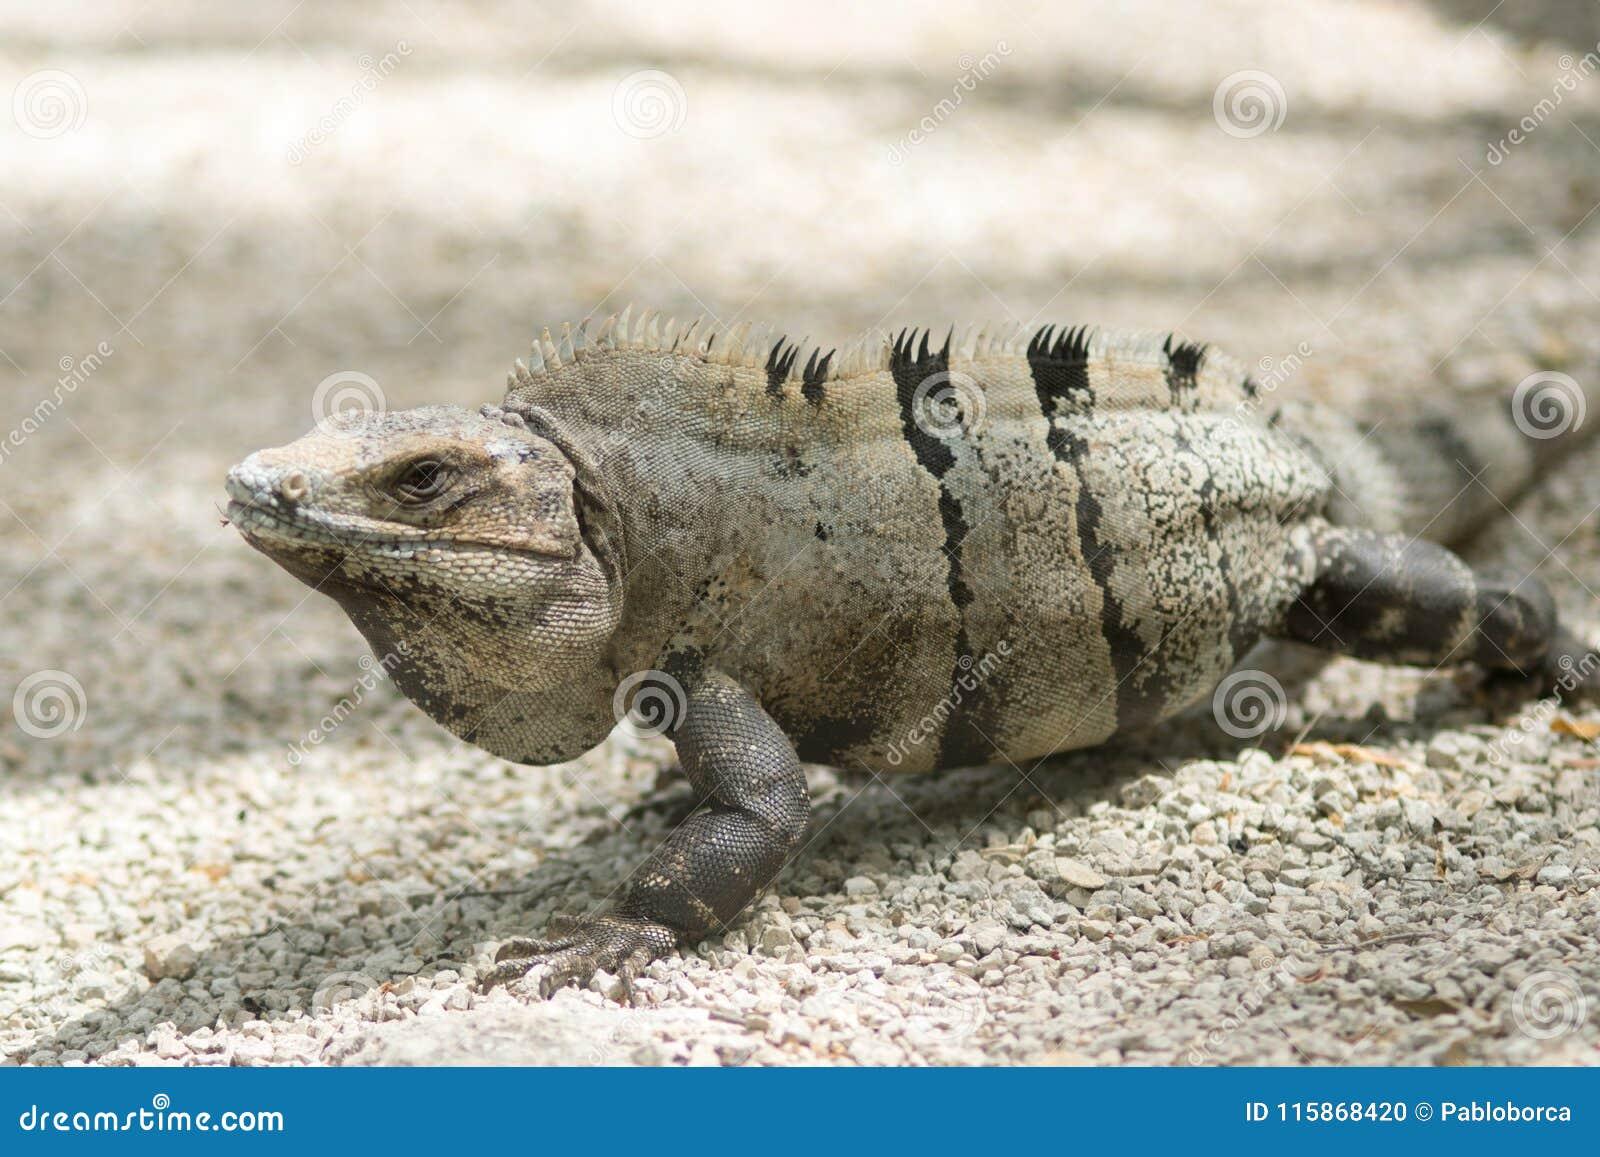 Mexican iguana at Tulum ruins